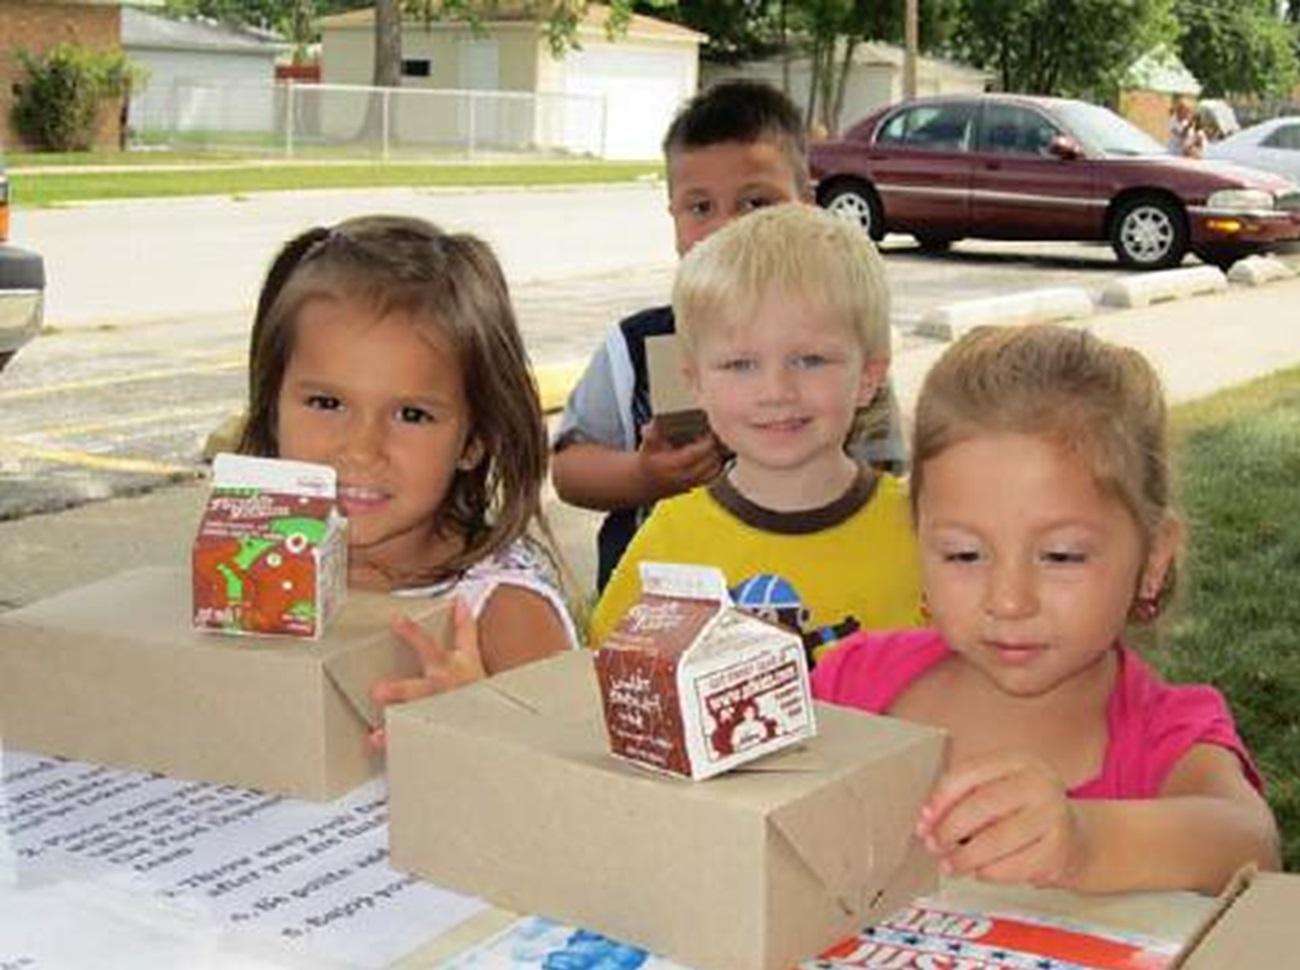 Holland United Methodist Church to Feed Local Children During Summer Months